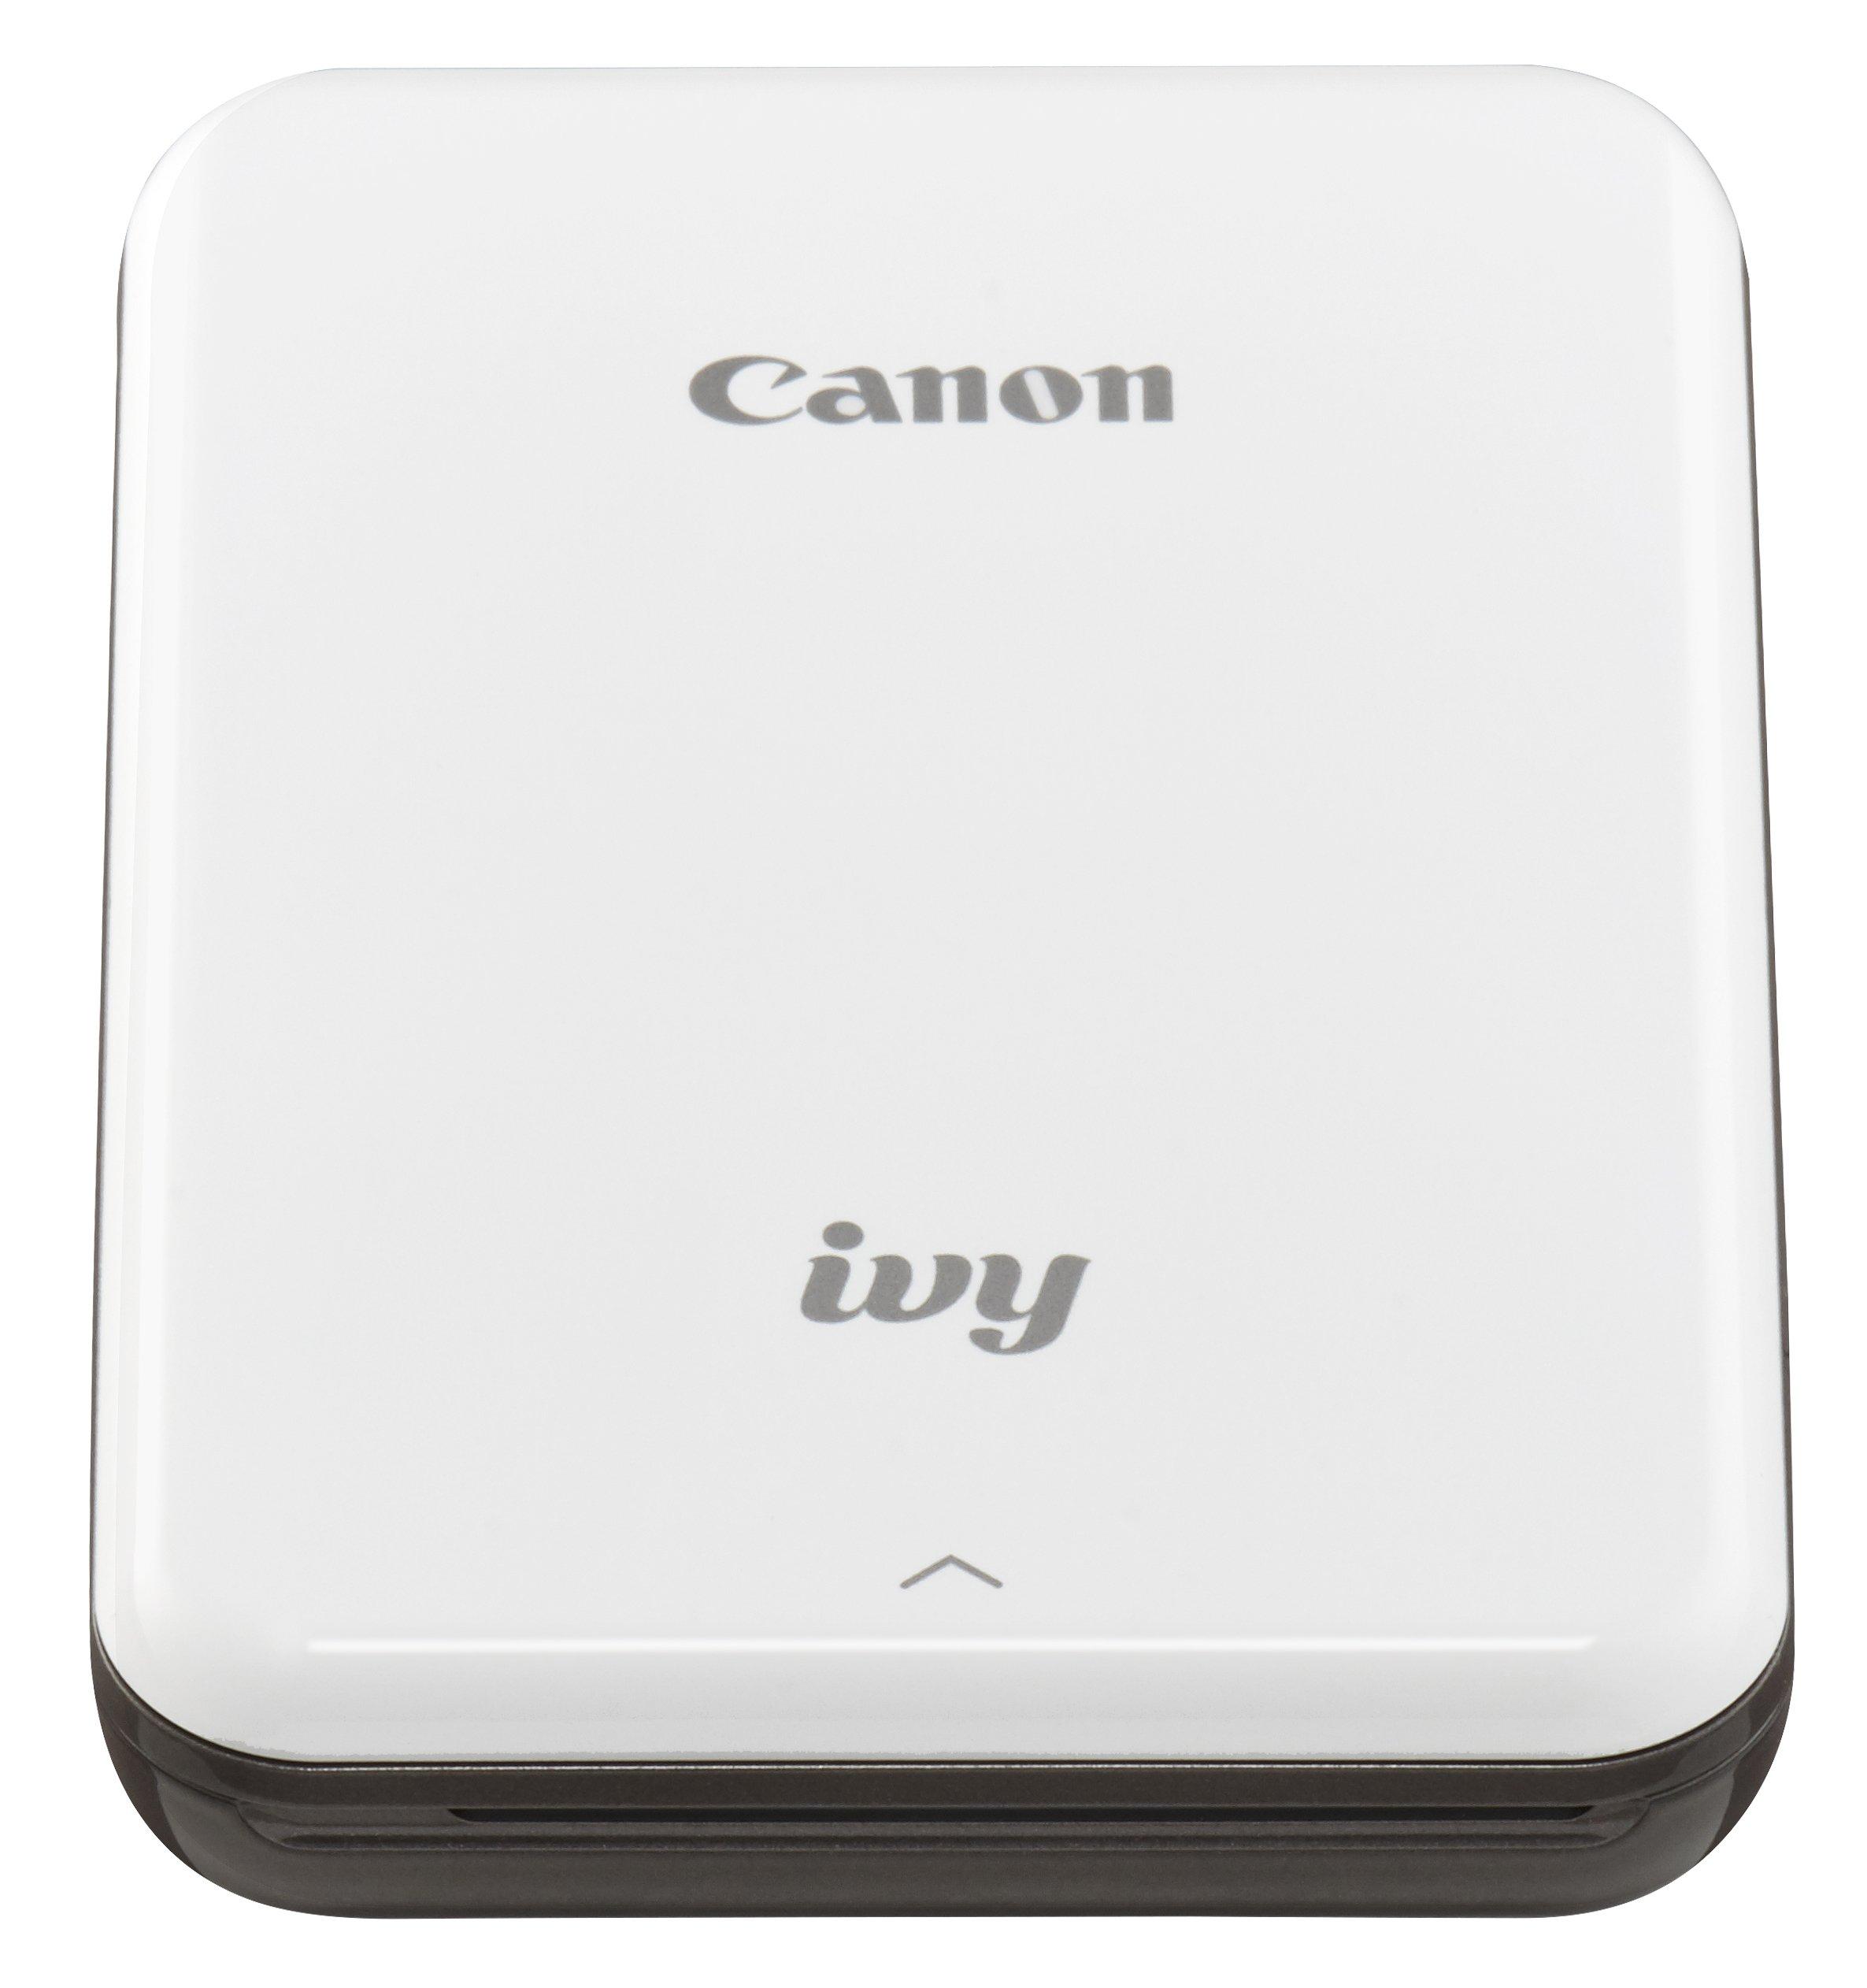 Canon IVY Mobile Mini Photo Printer through Bluetooth(R), Slate Gray by Canon (Image #9)